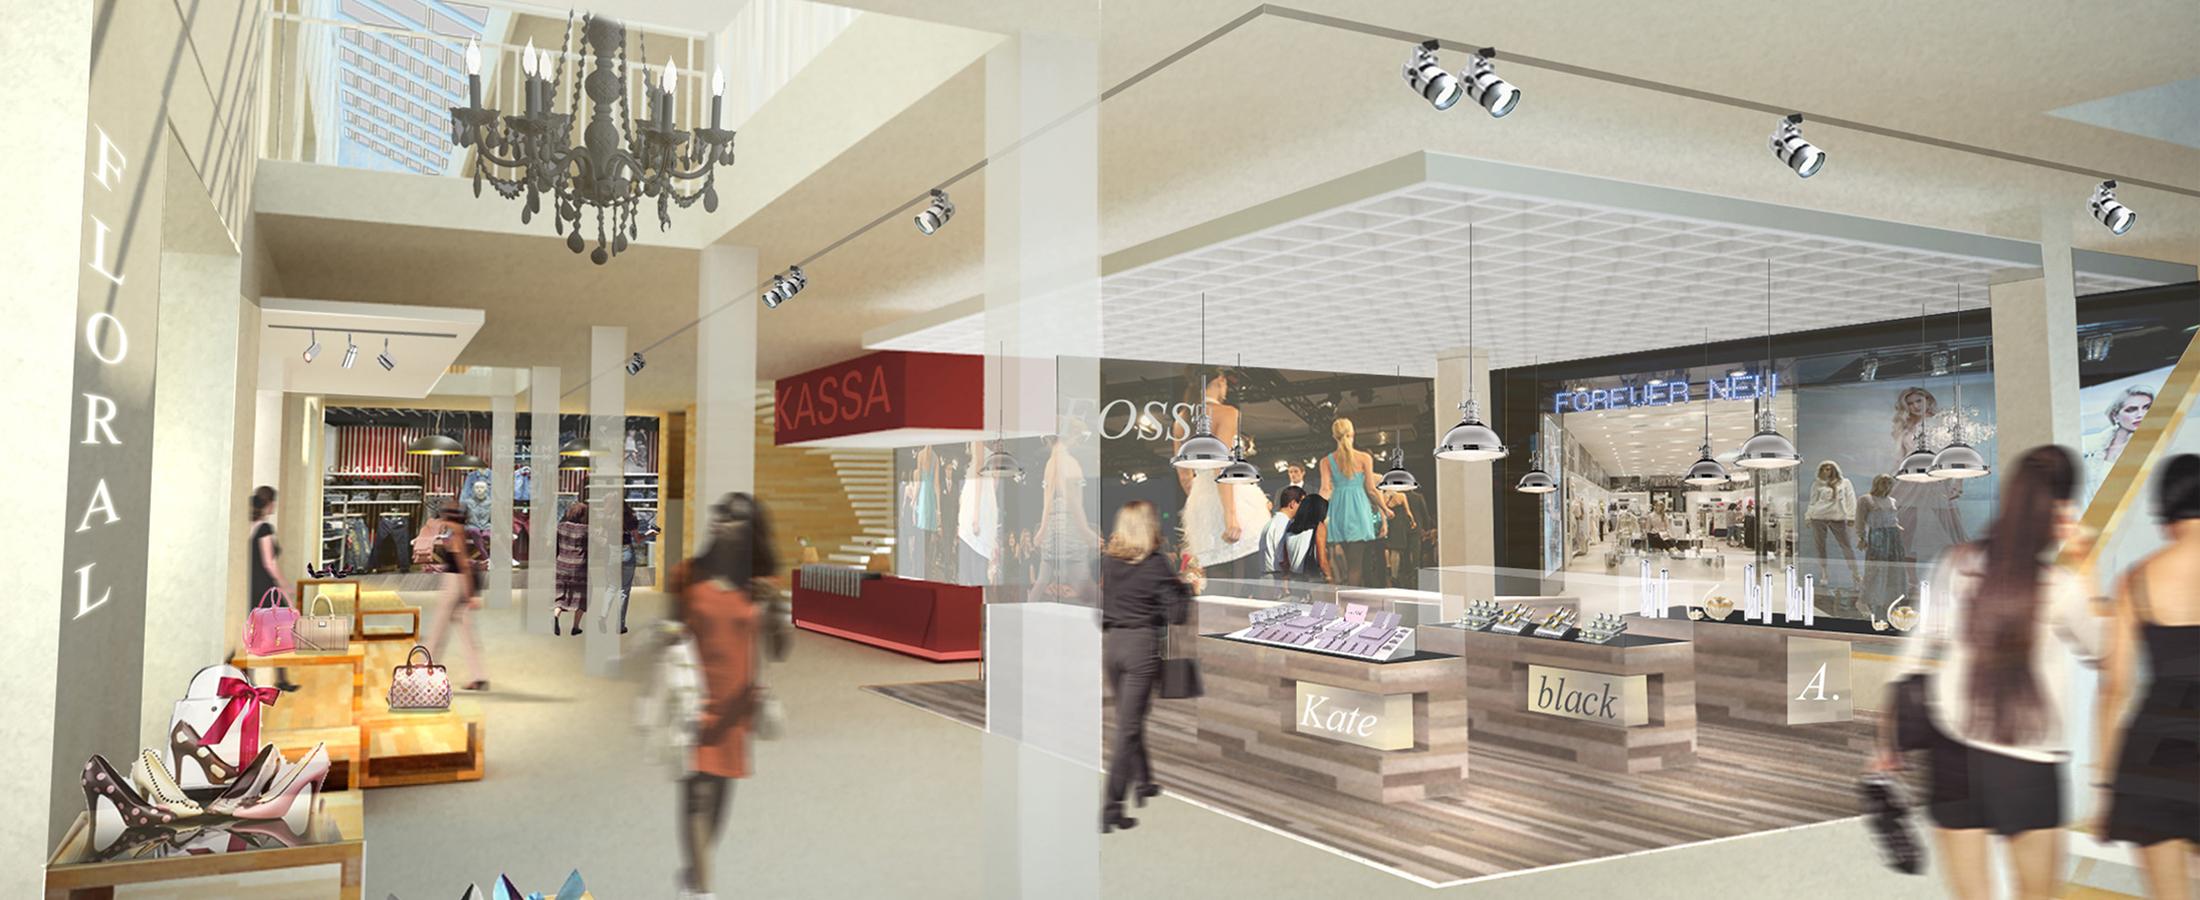 Fashion Outlet Store, Oude Passage Schiedam